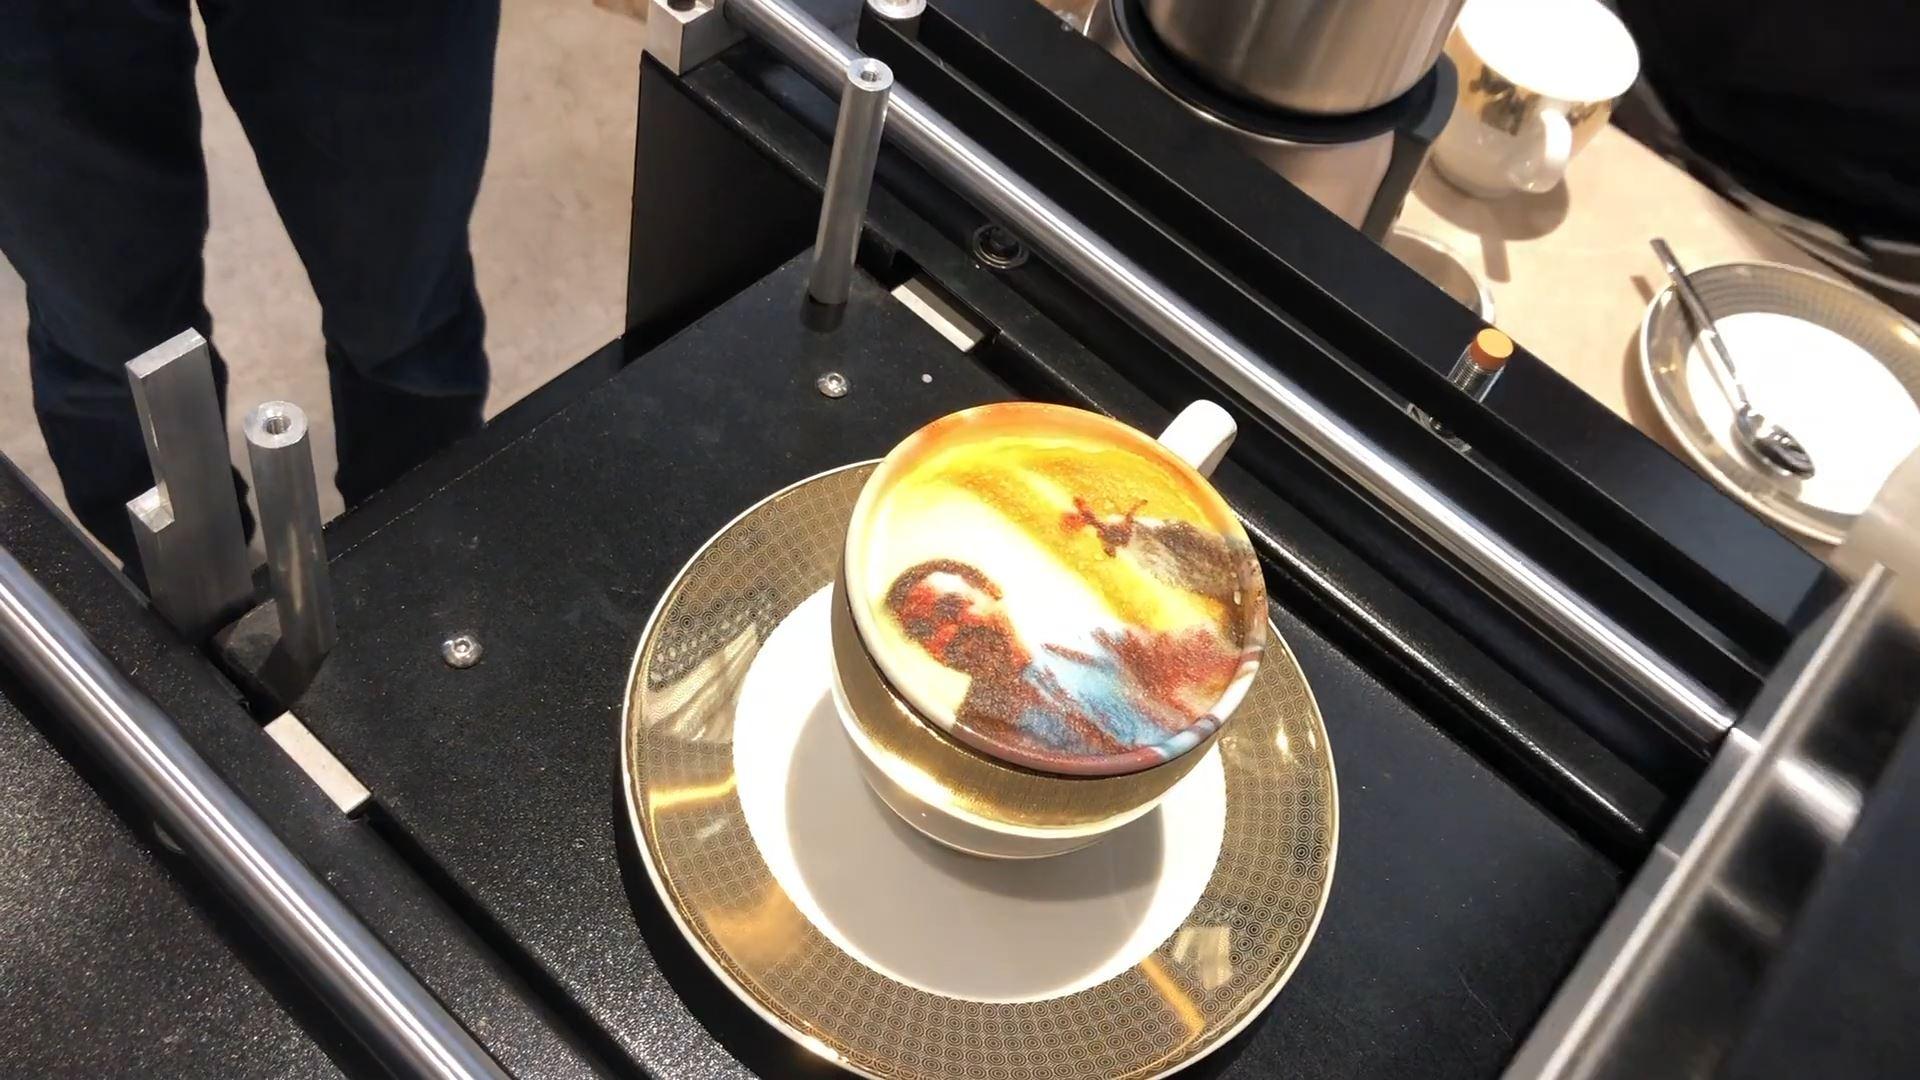 sharjah e-Government retreat interactive technology integration coffee printer